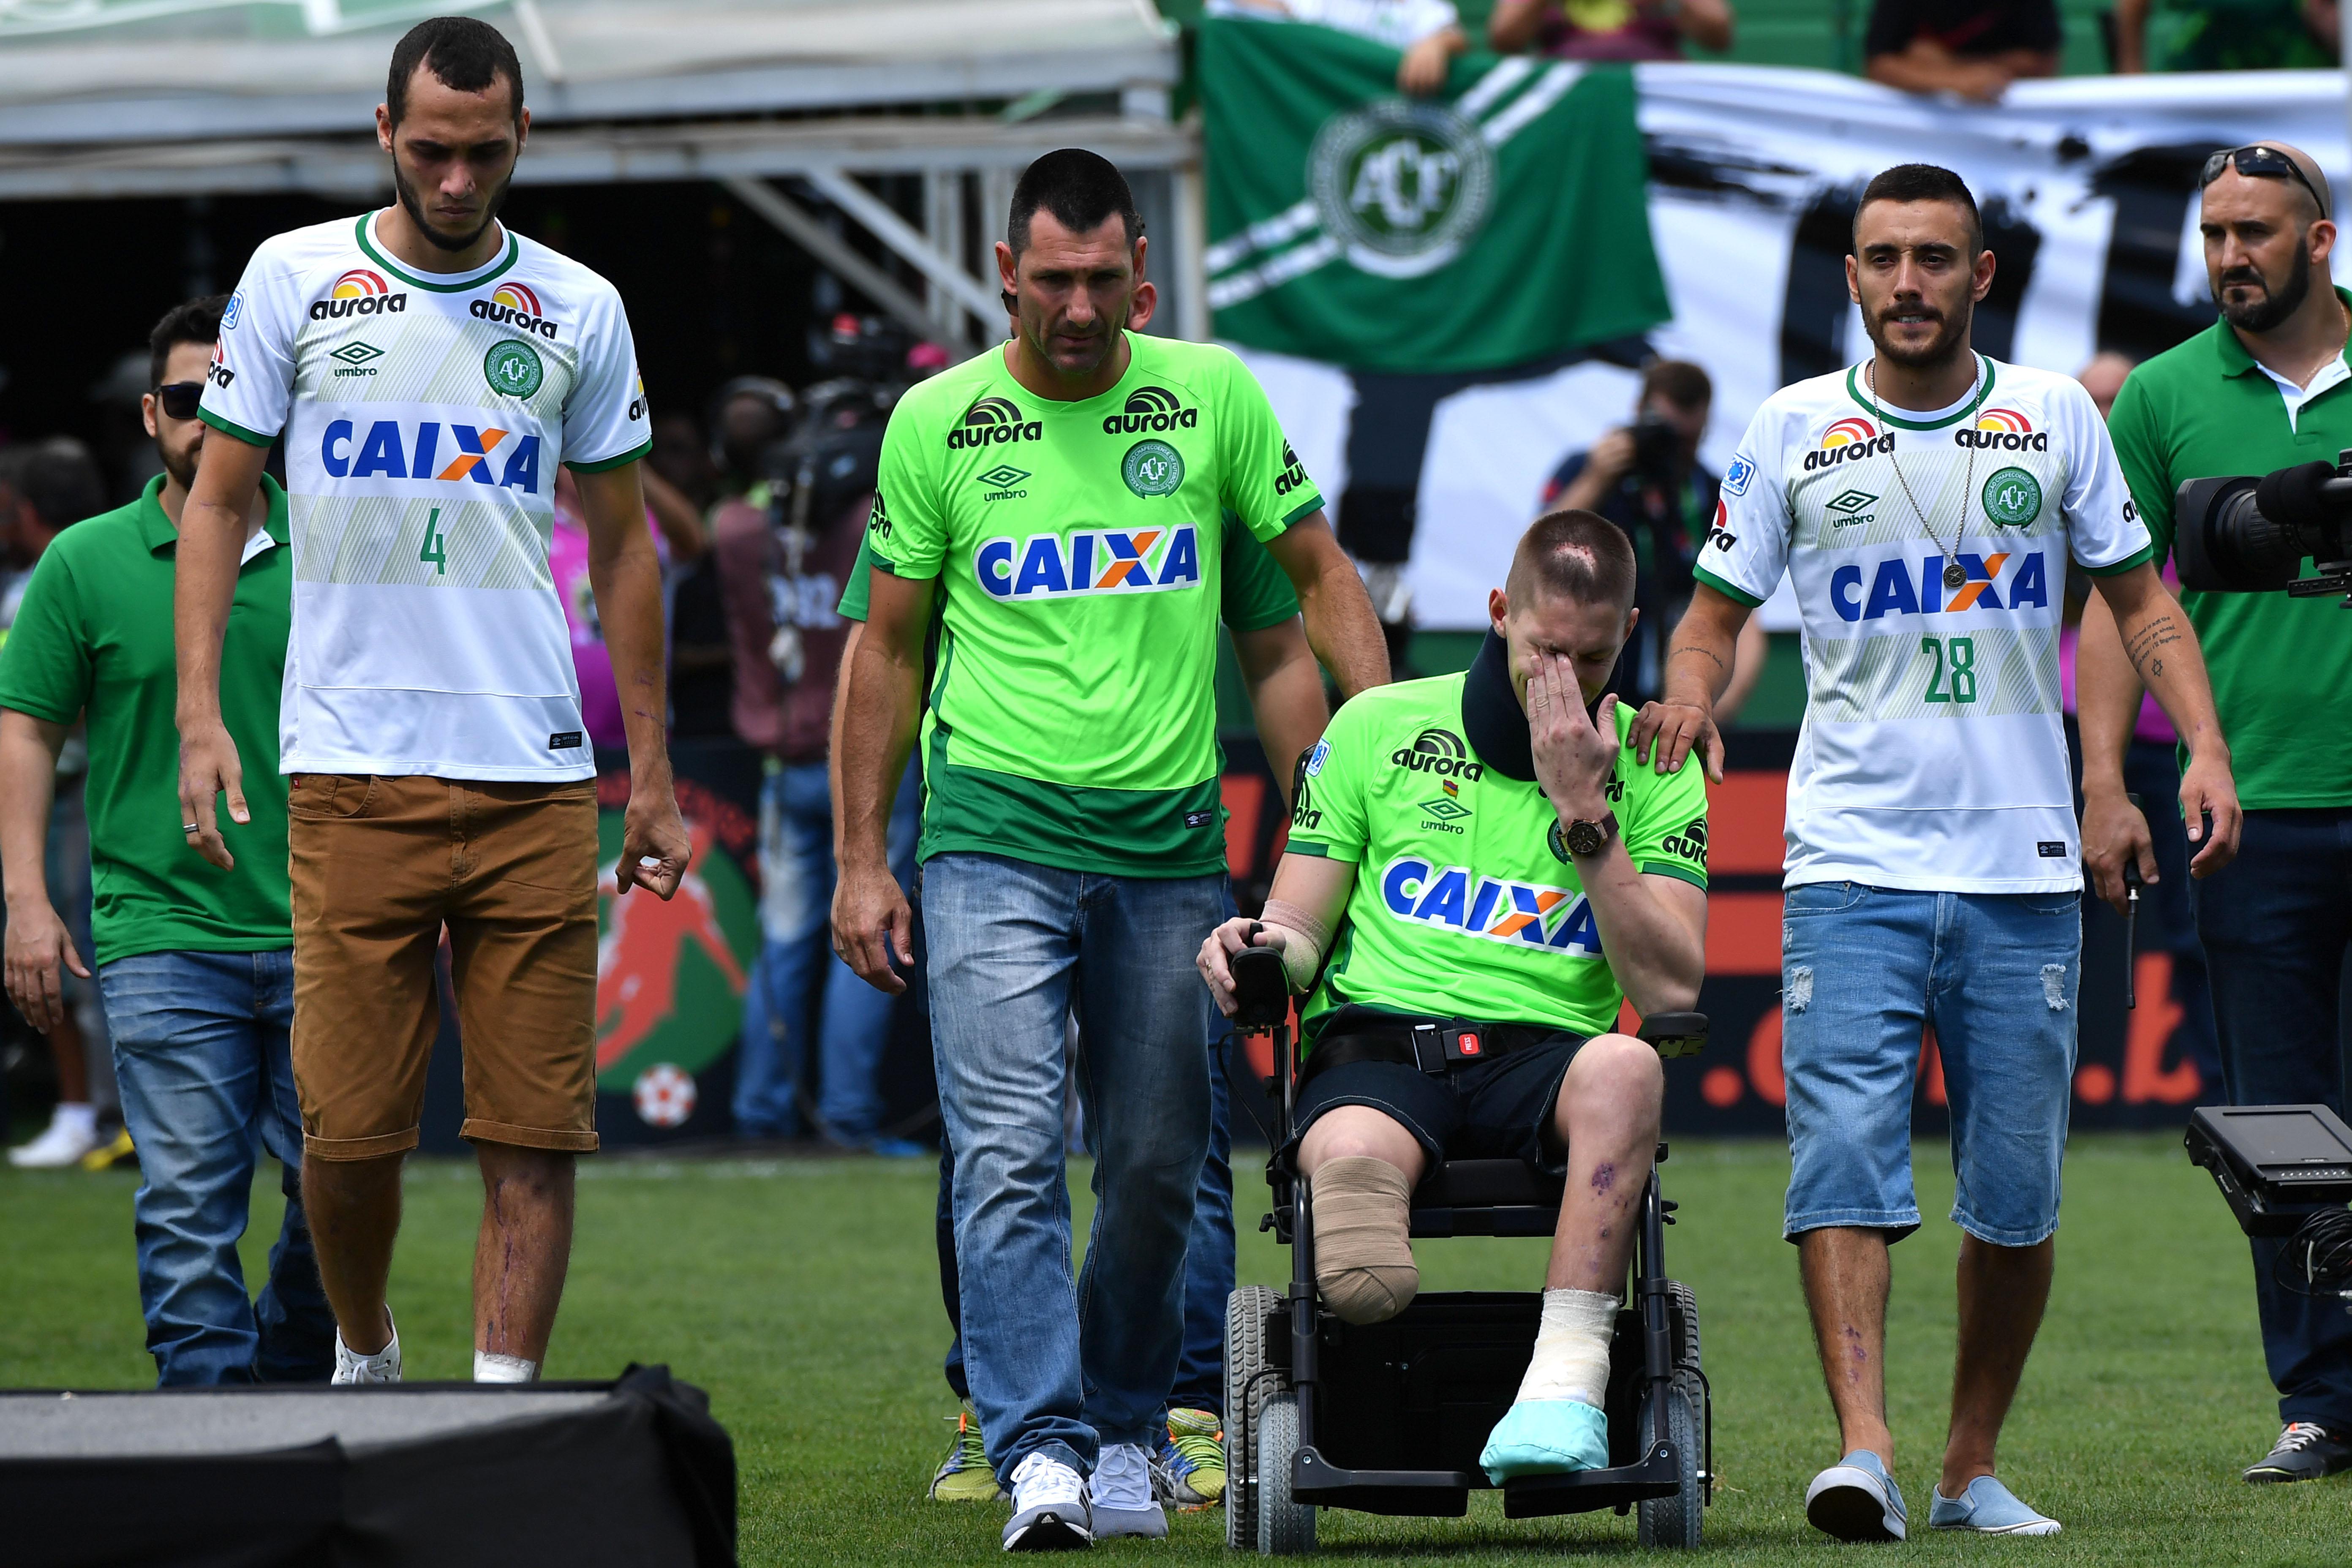 Sobrevivientes del Chapecoense reciben Copa Sudamericana.